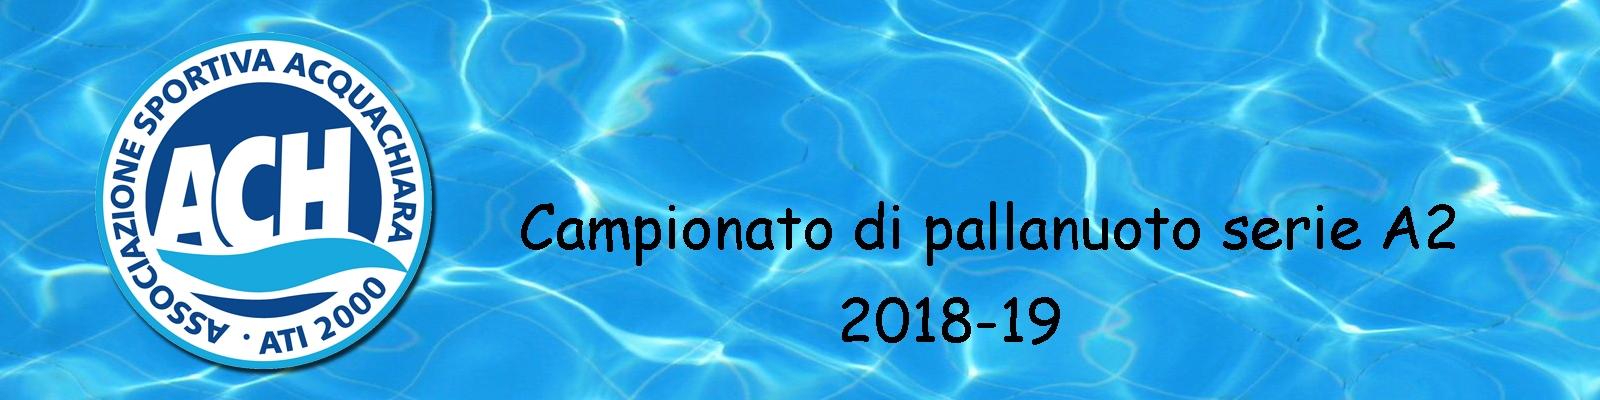 Acquachiara anno 2018-19